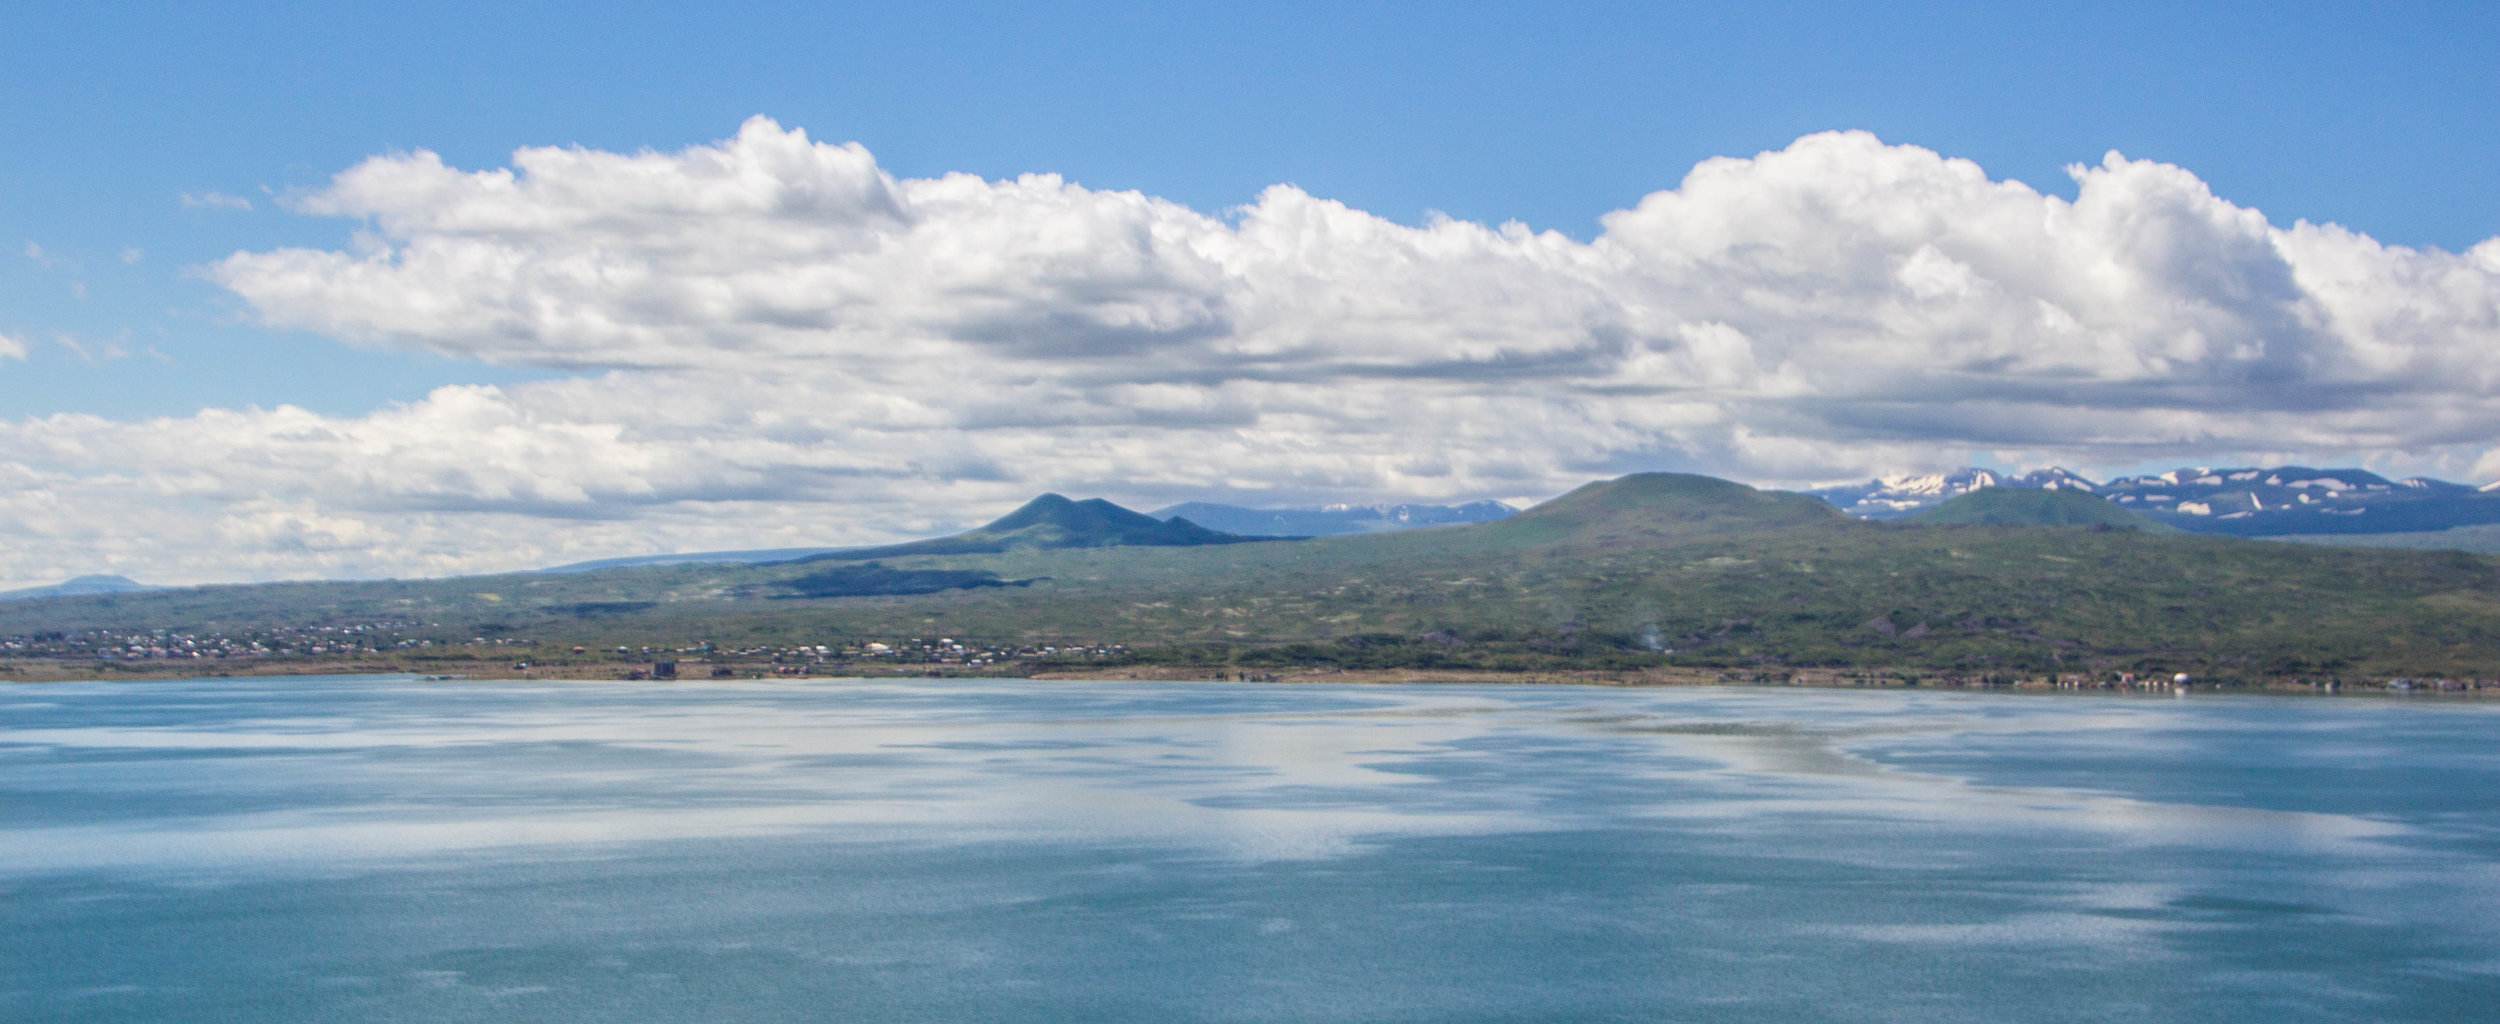 sevanavank-lake-sevan-armenia-23.jpg